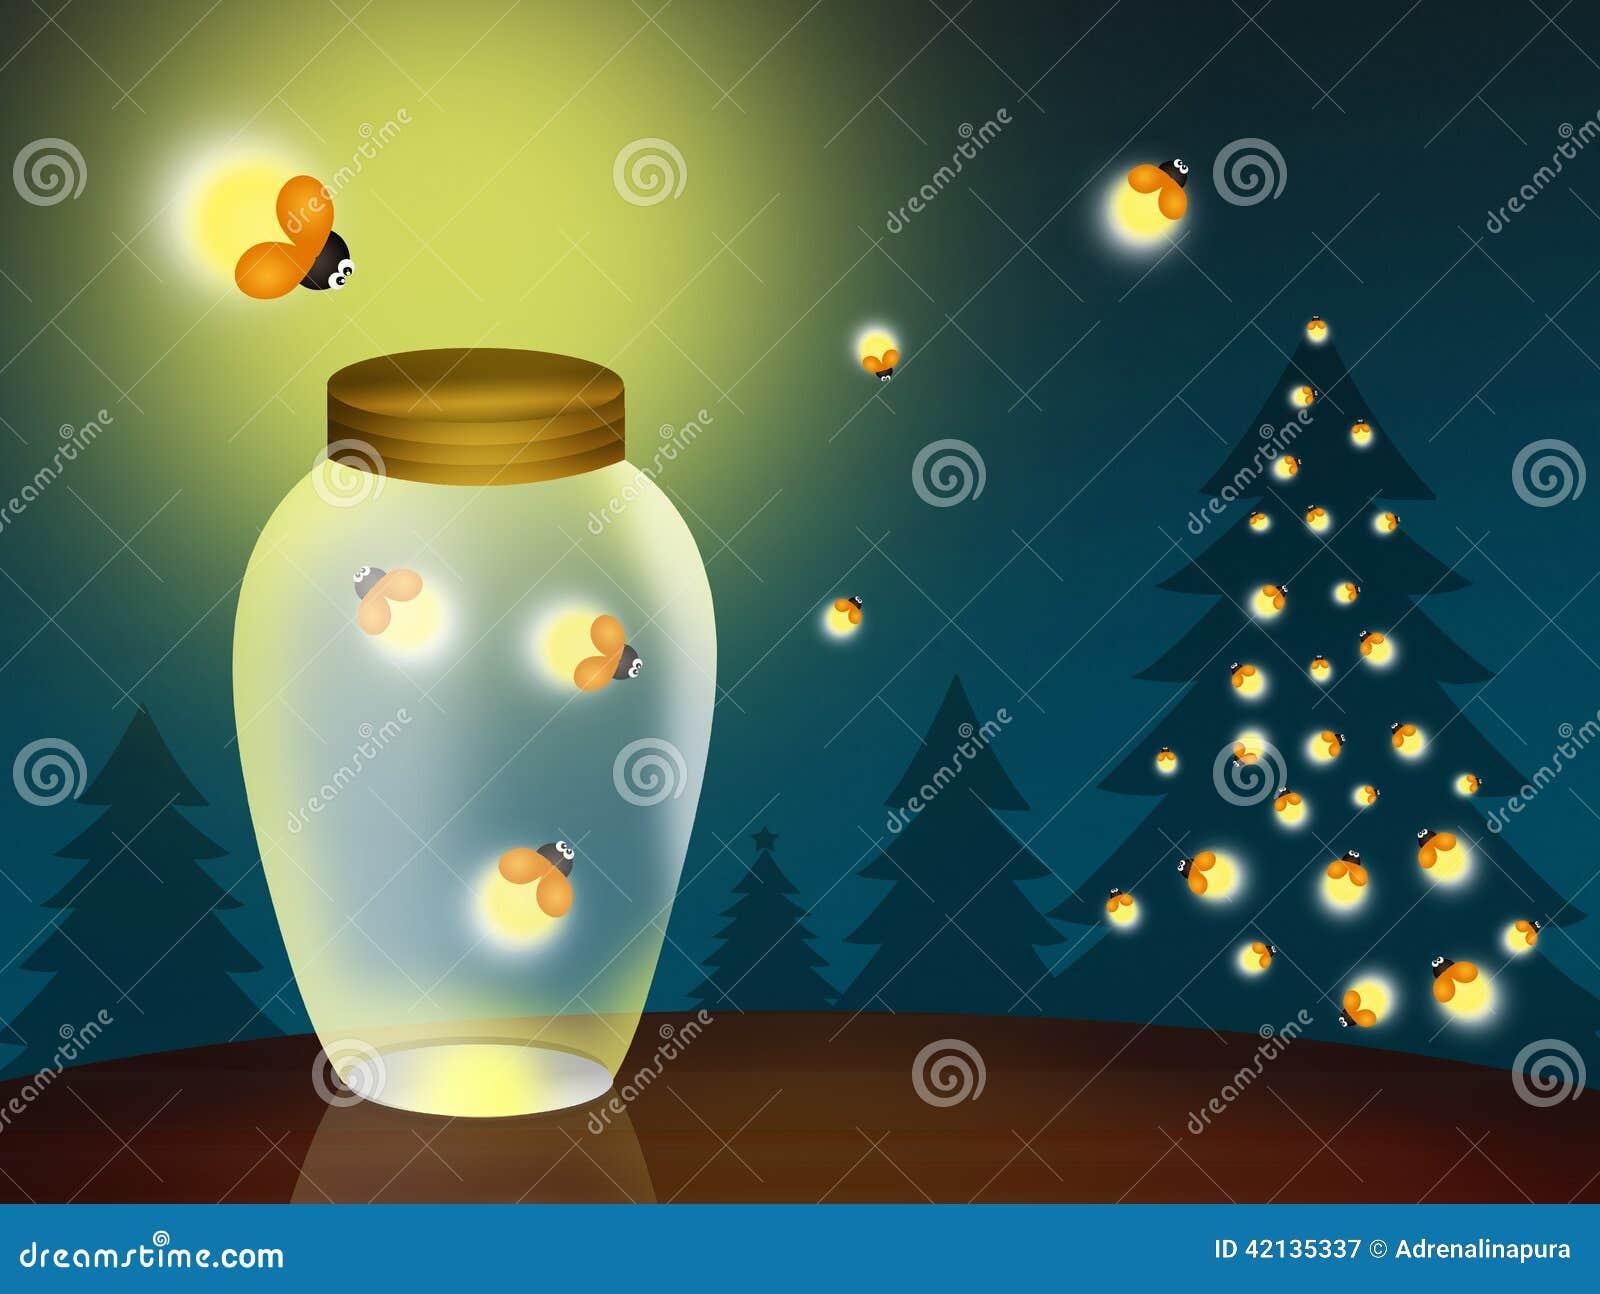 Glimwormen bij Kerstmis